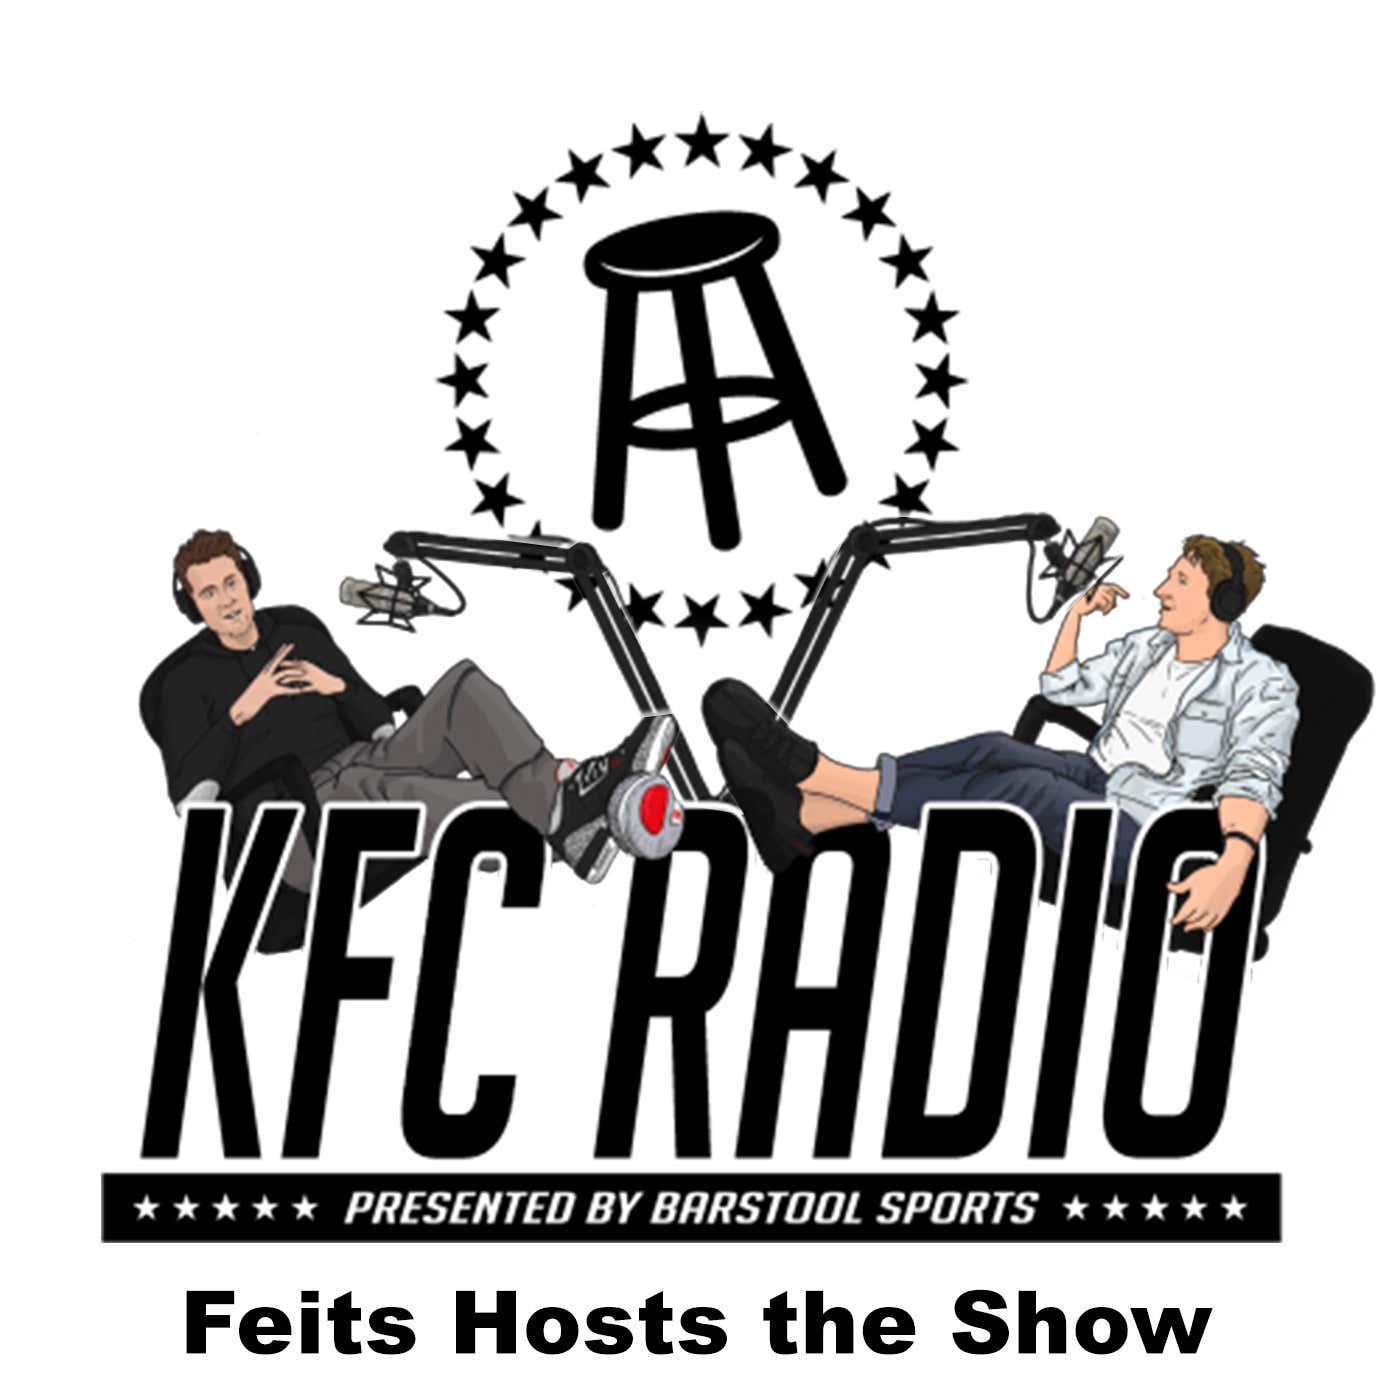 John Henry Feitelberg Hosts the Show